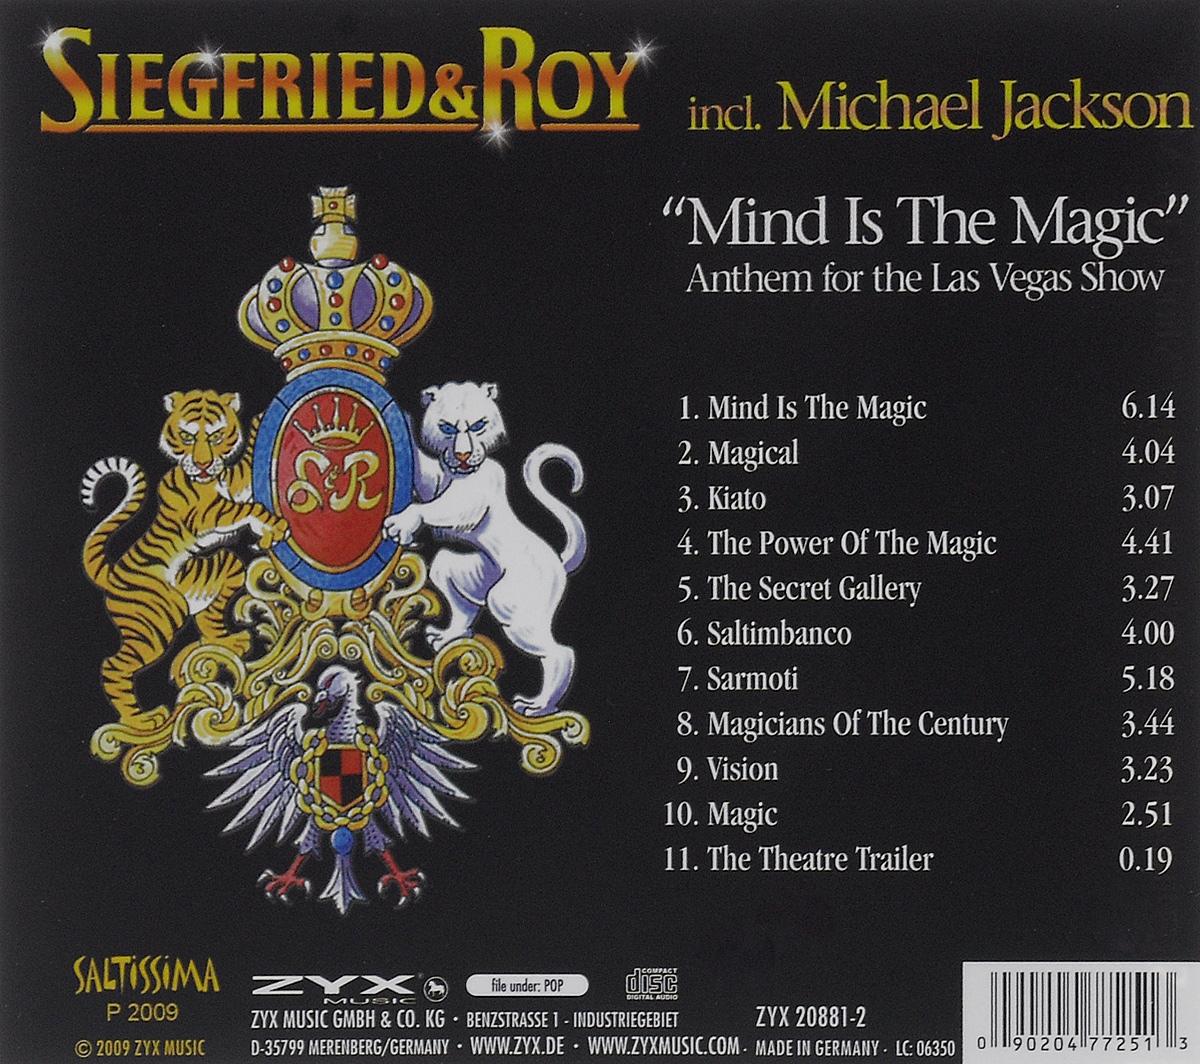 Siegfried & Roy. Mind Is The Magic. Siegfried & Roy Orchestra